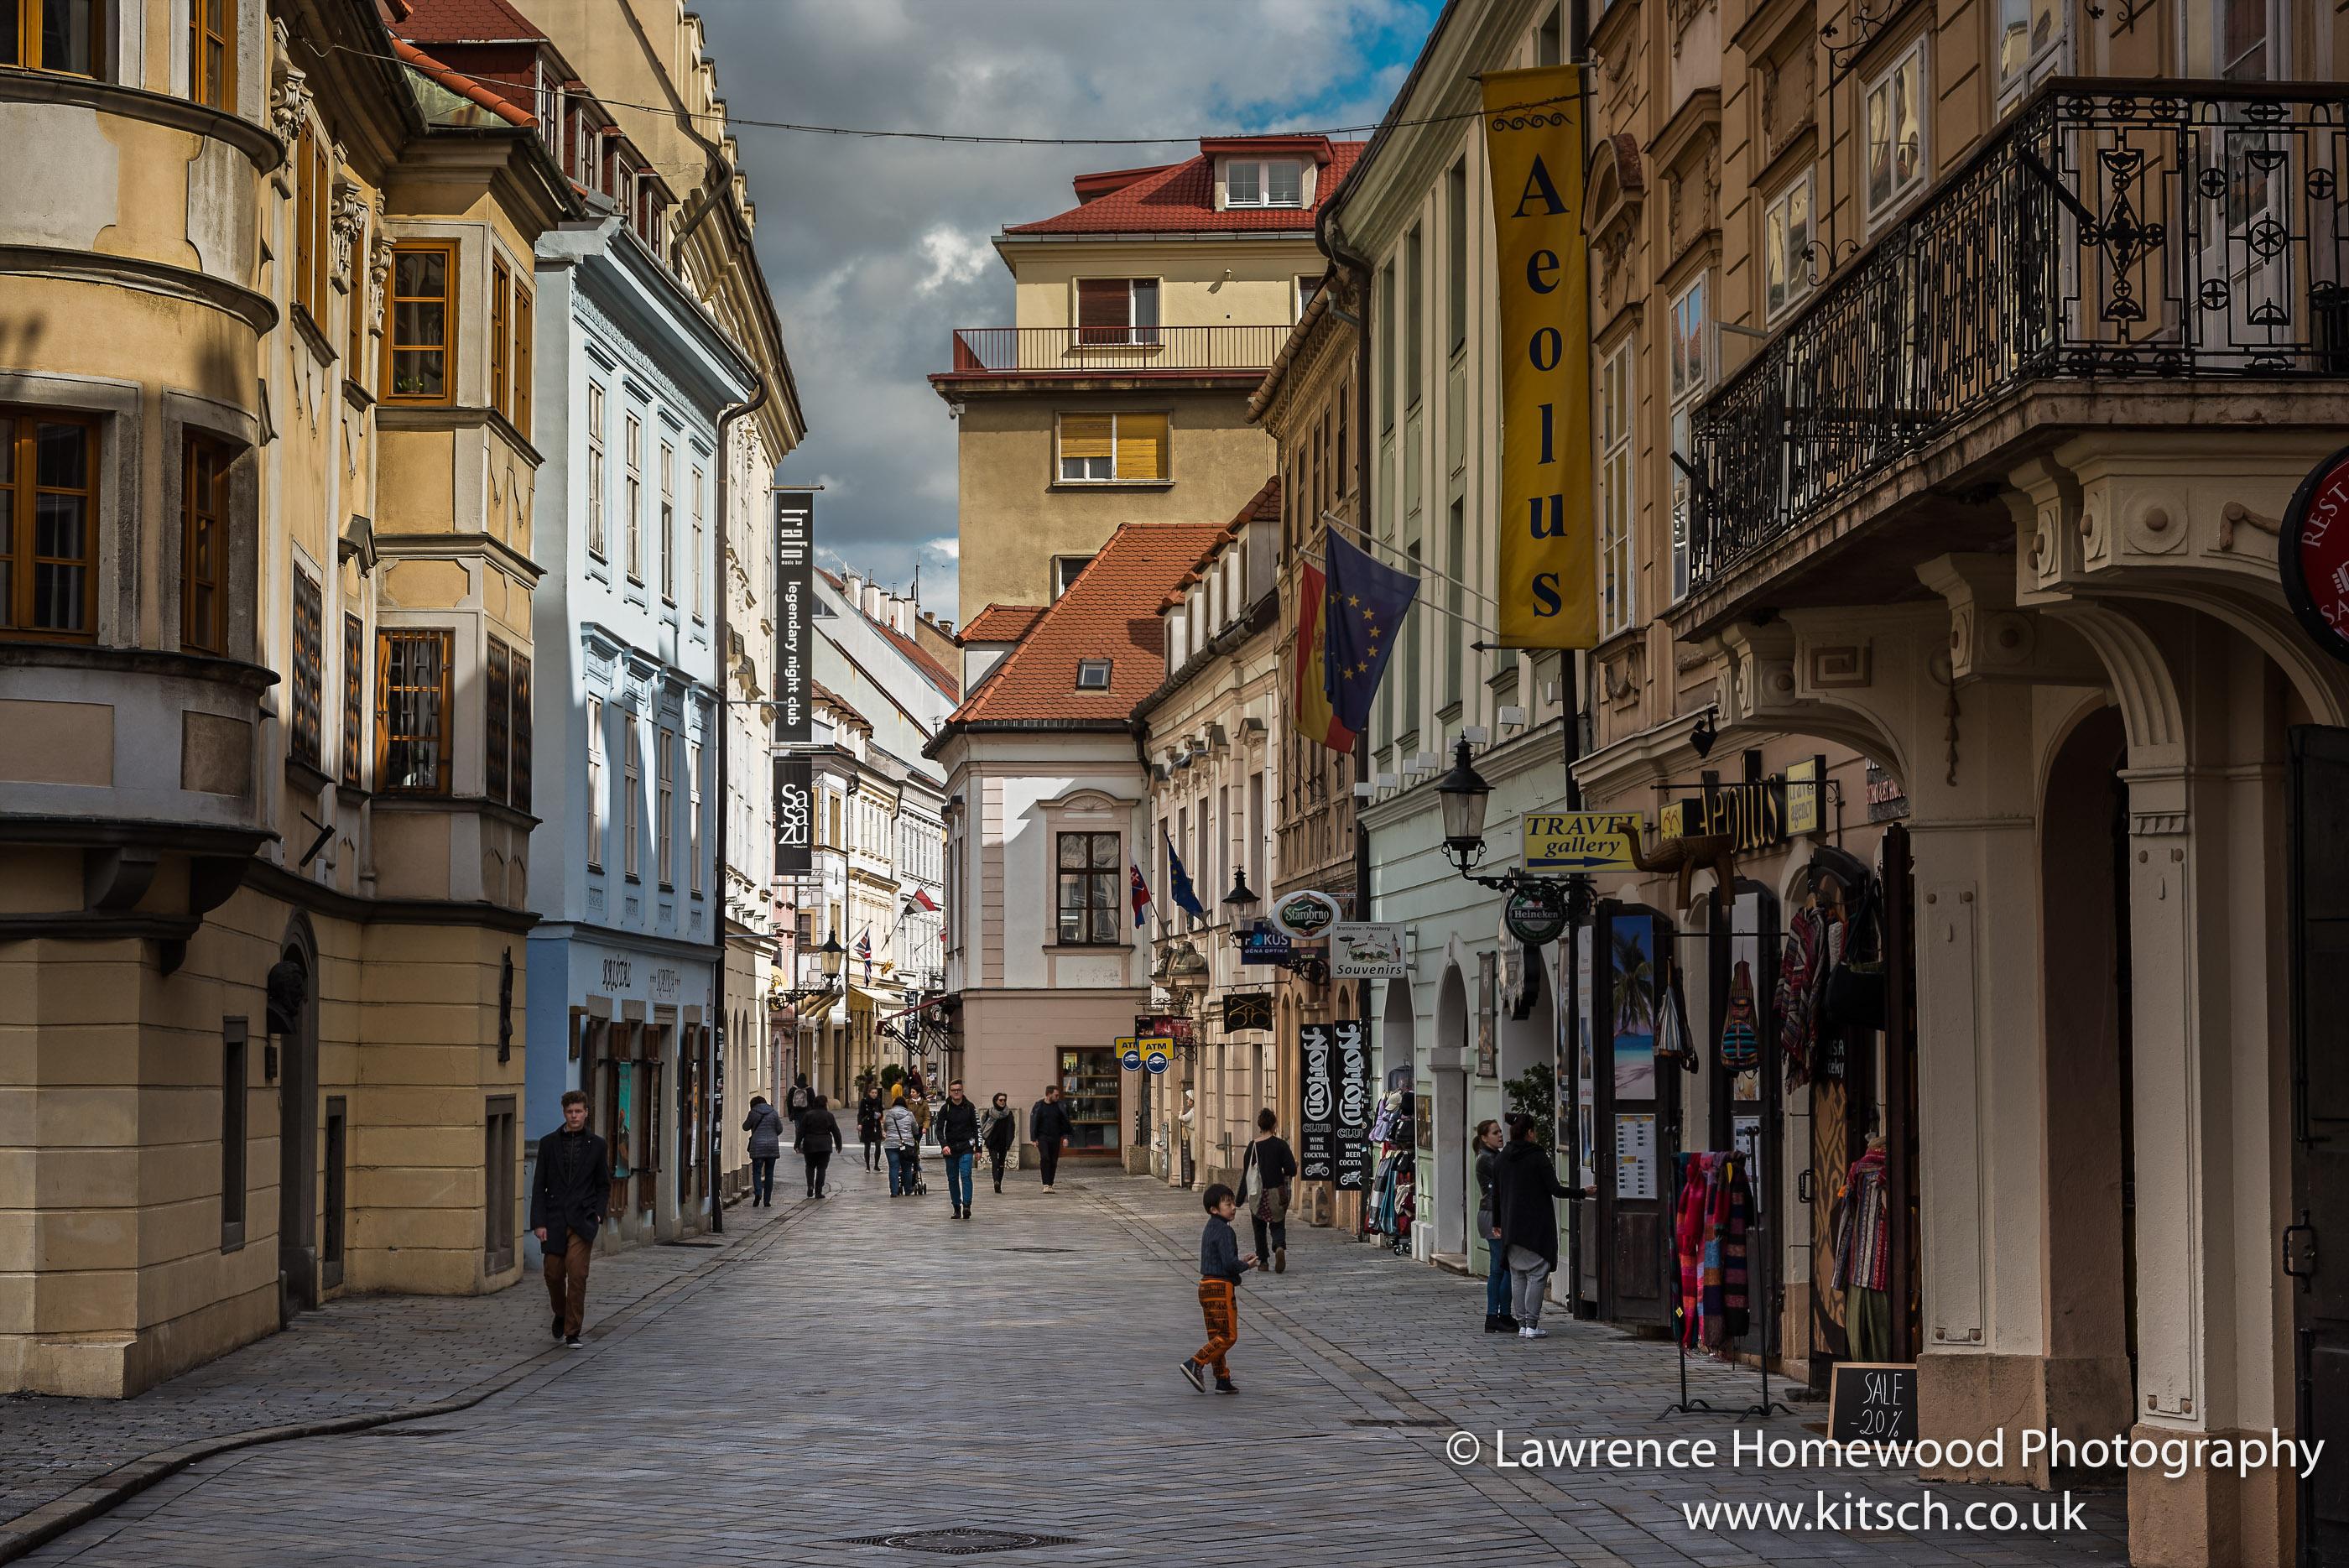 The Streets of Bratislava